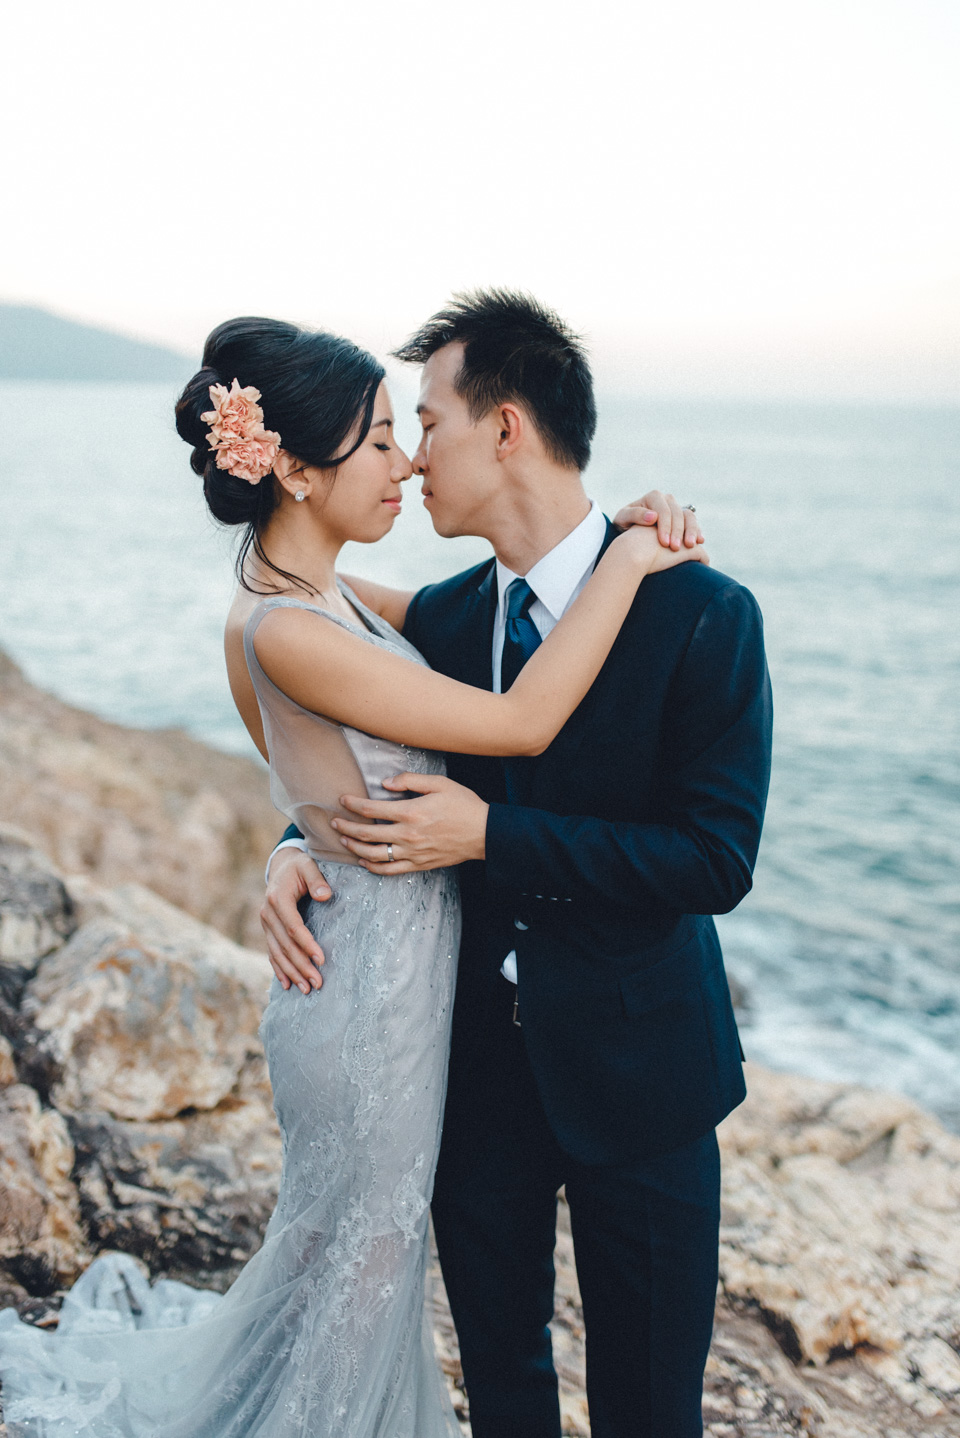 shooting-hongkong-beach-45 After Weddingshoot in HongKongshooting hongkong beach 45